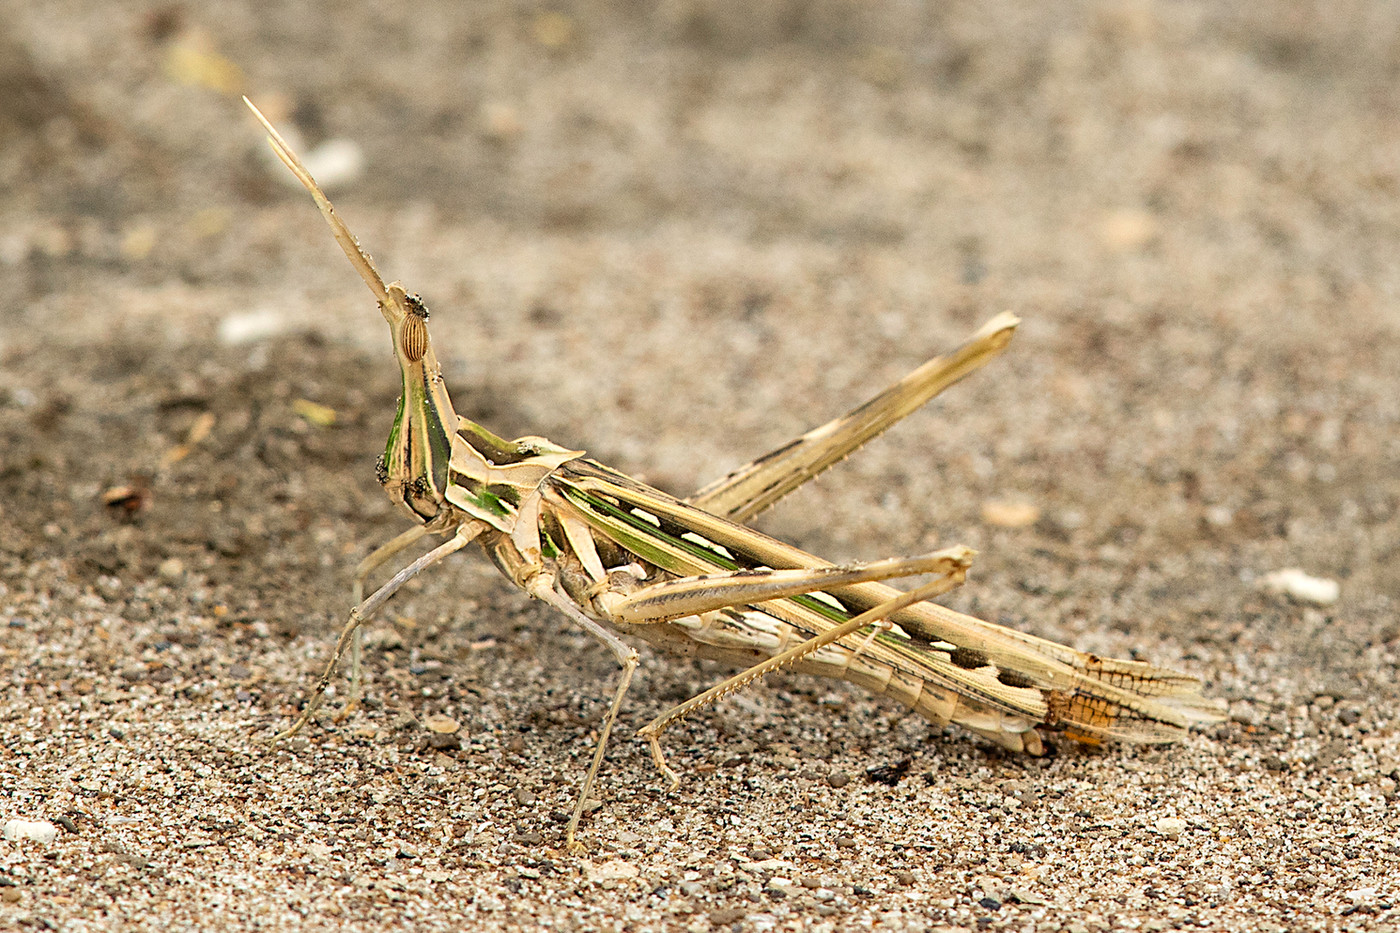 Common Stick Grasshopper on the shores of Lake Manyara, Tanzania